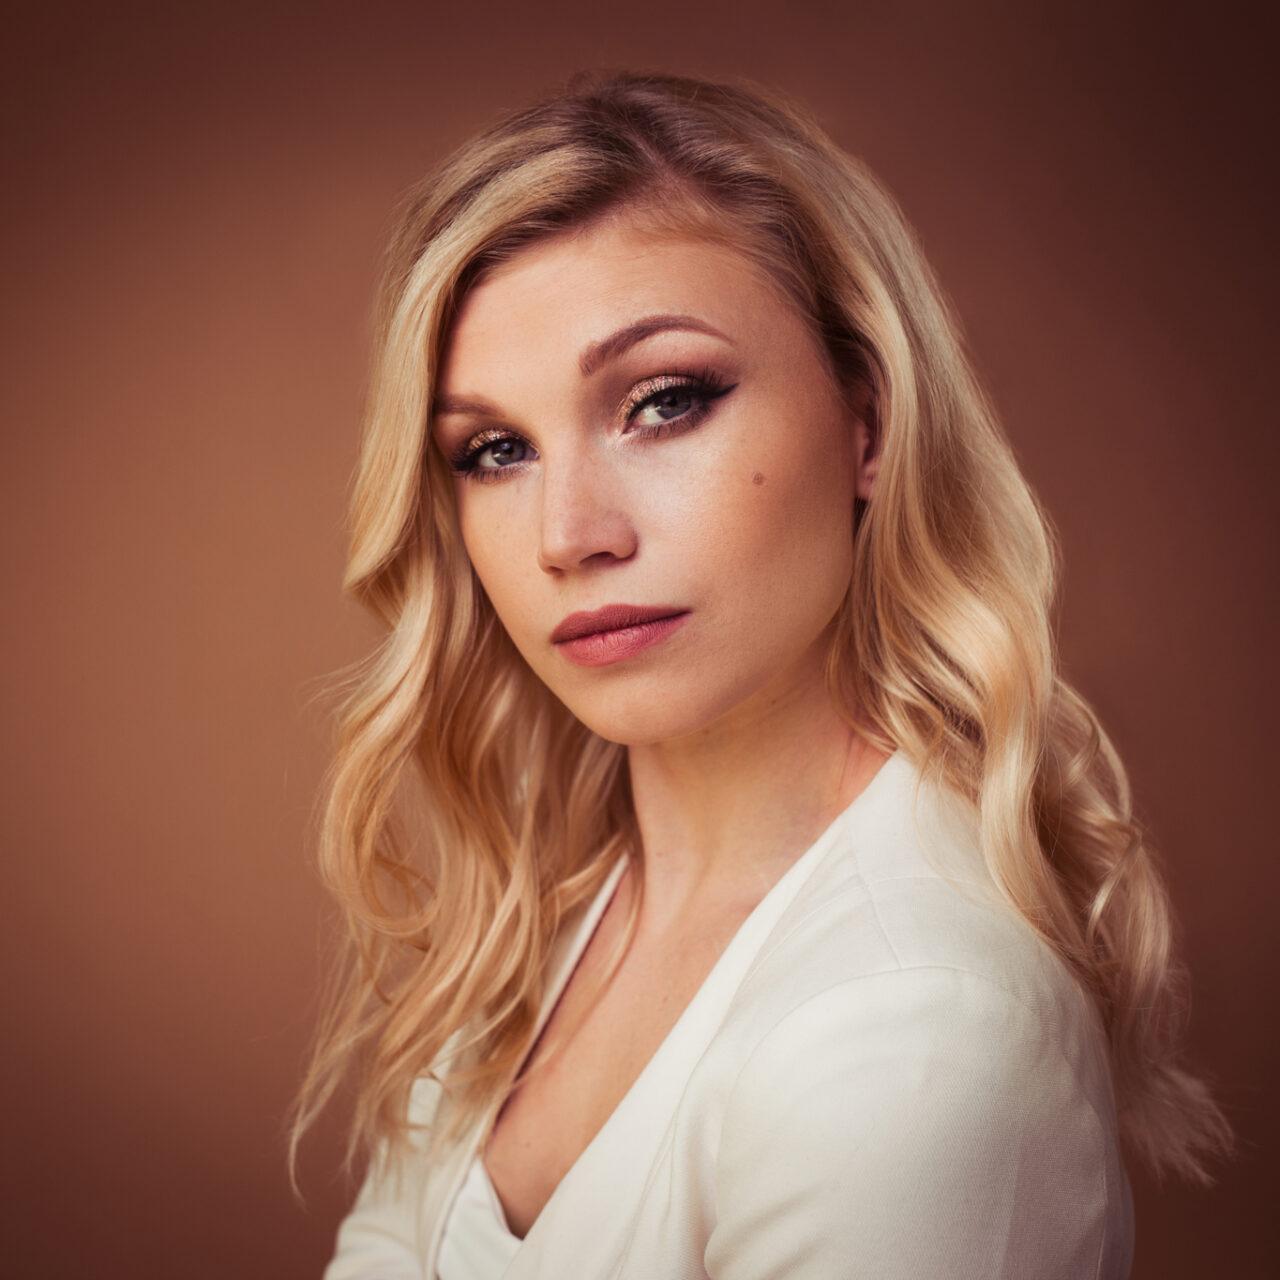 Anita Kozlowska